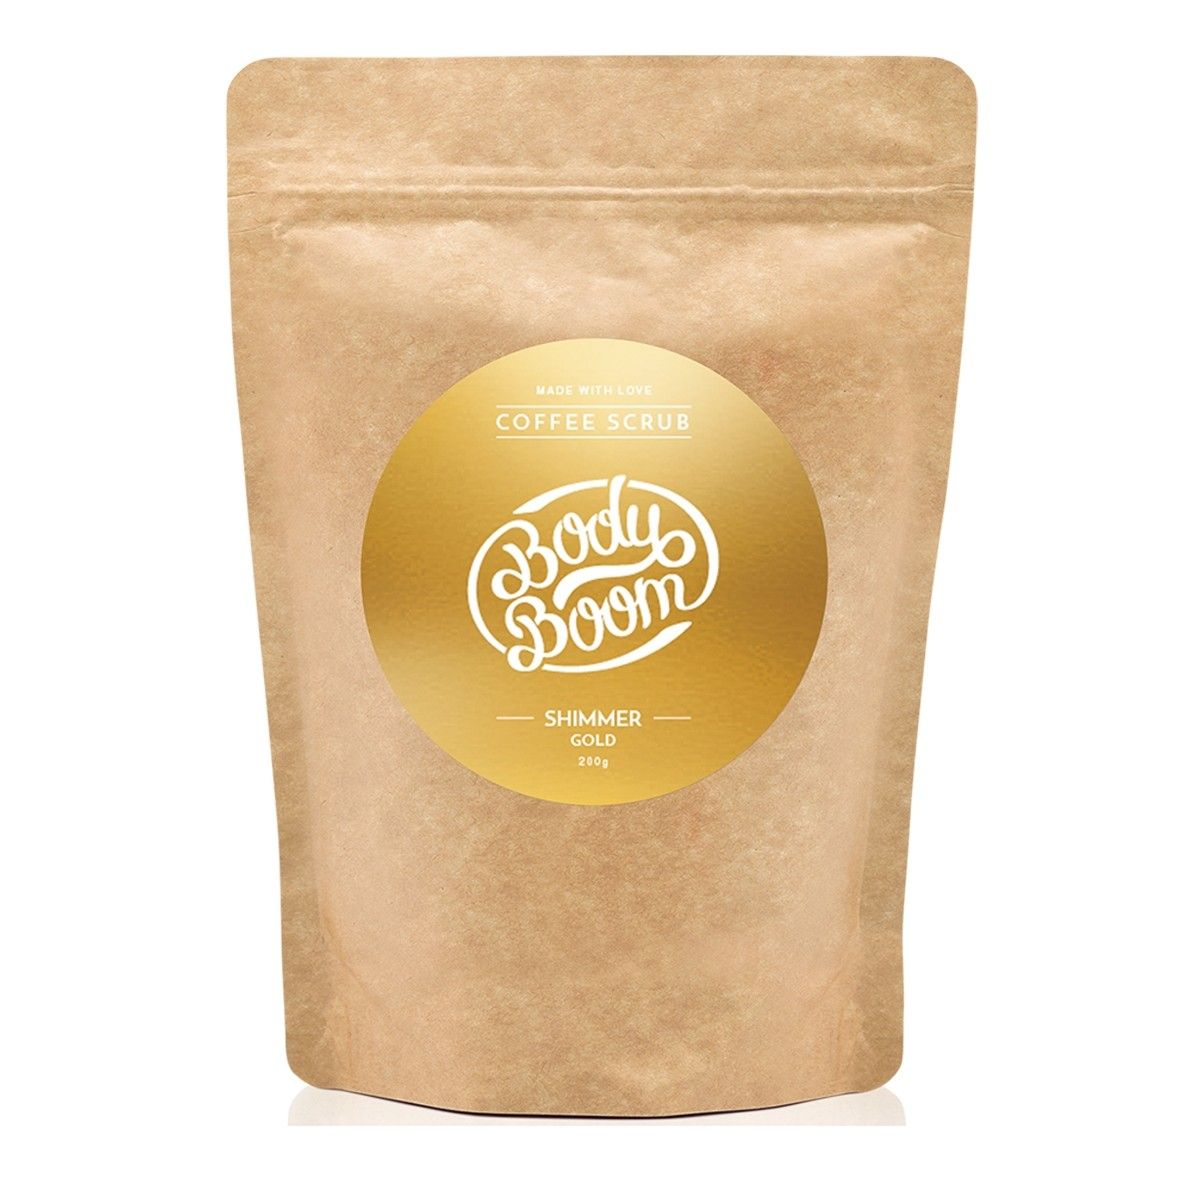 Afbeelding van Bodyboom Coffee Scrub Shimmer Gold Bodyscrub Beauty